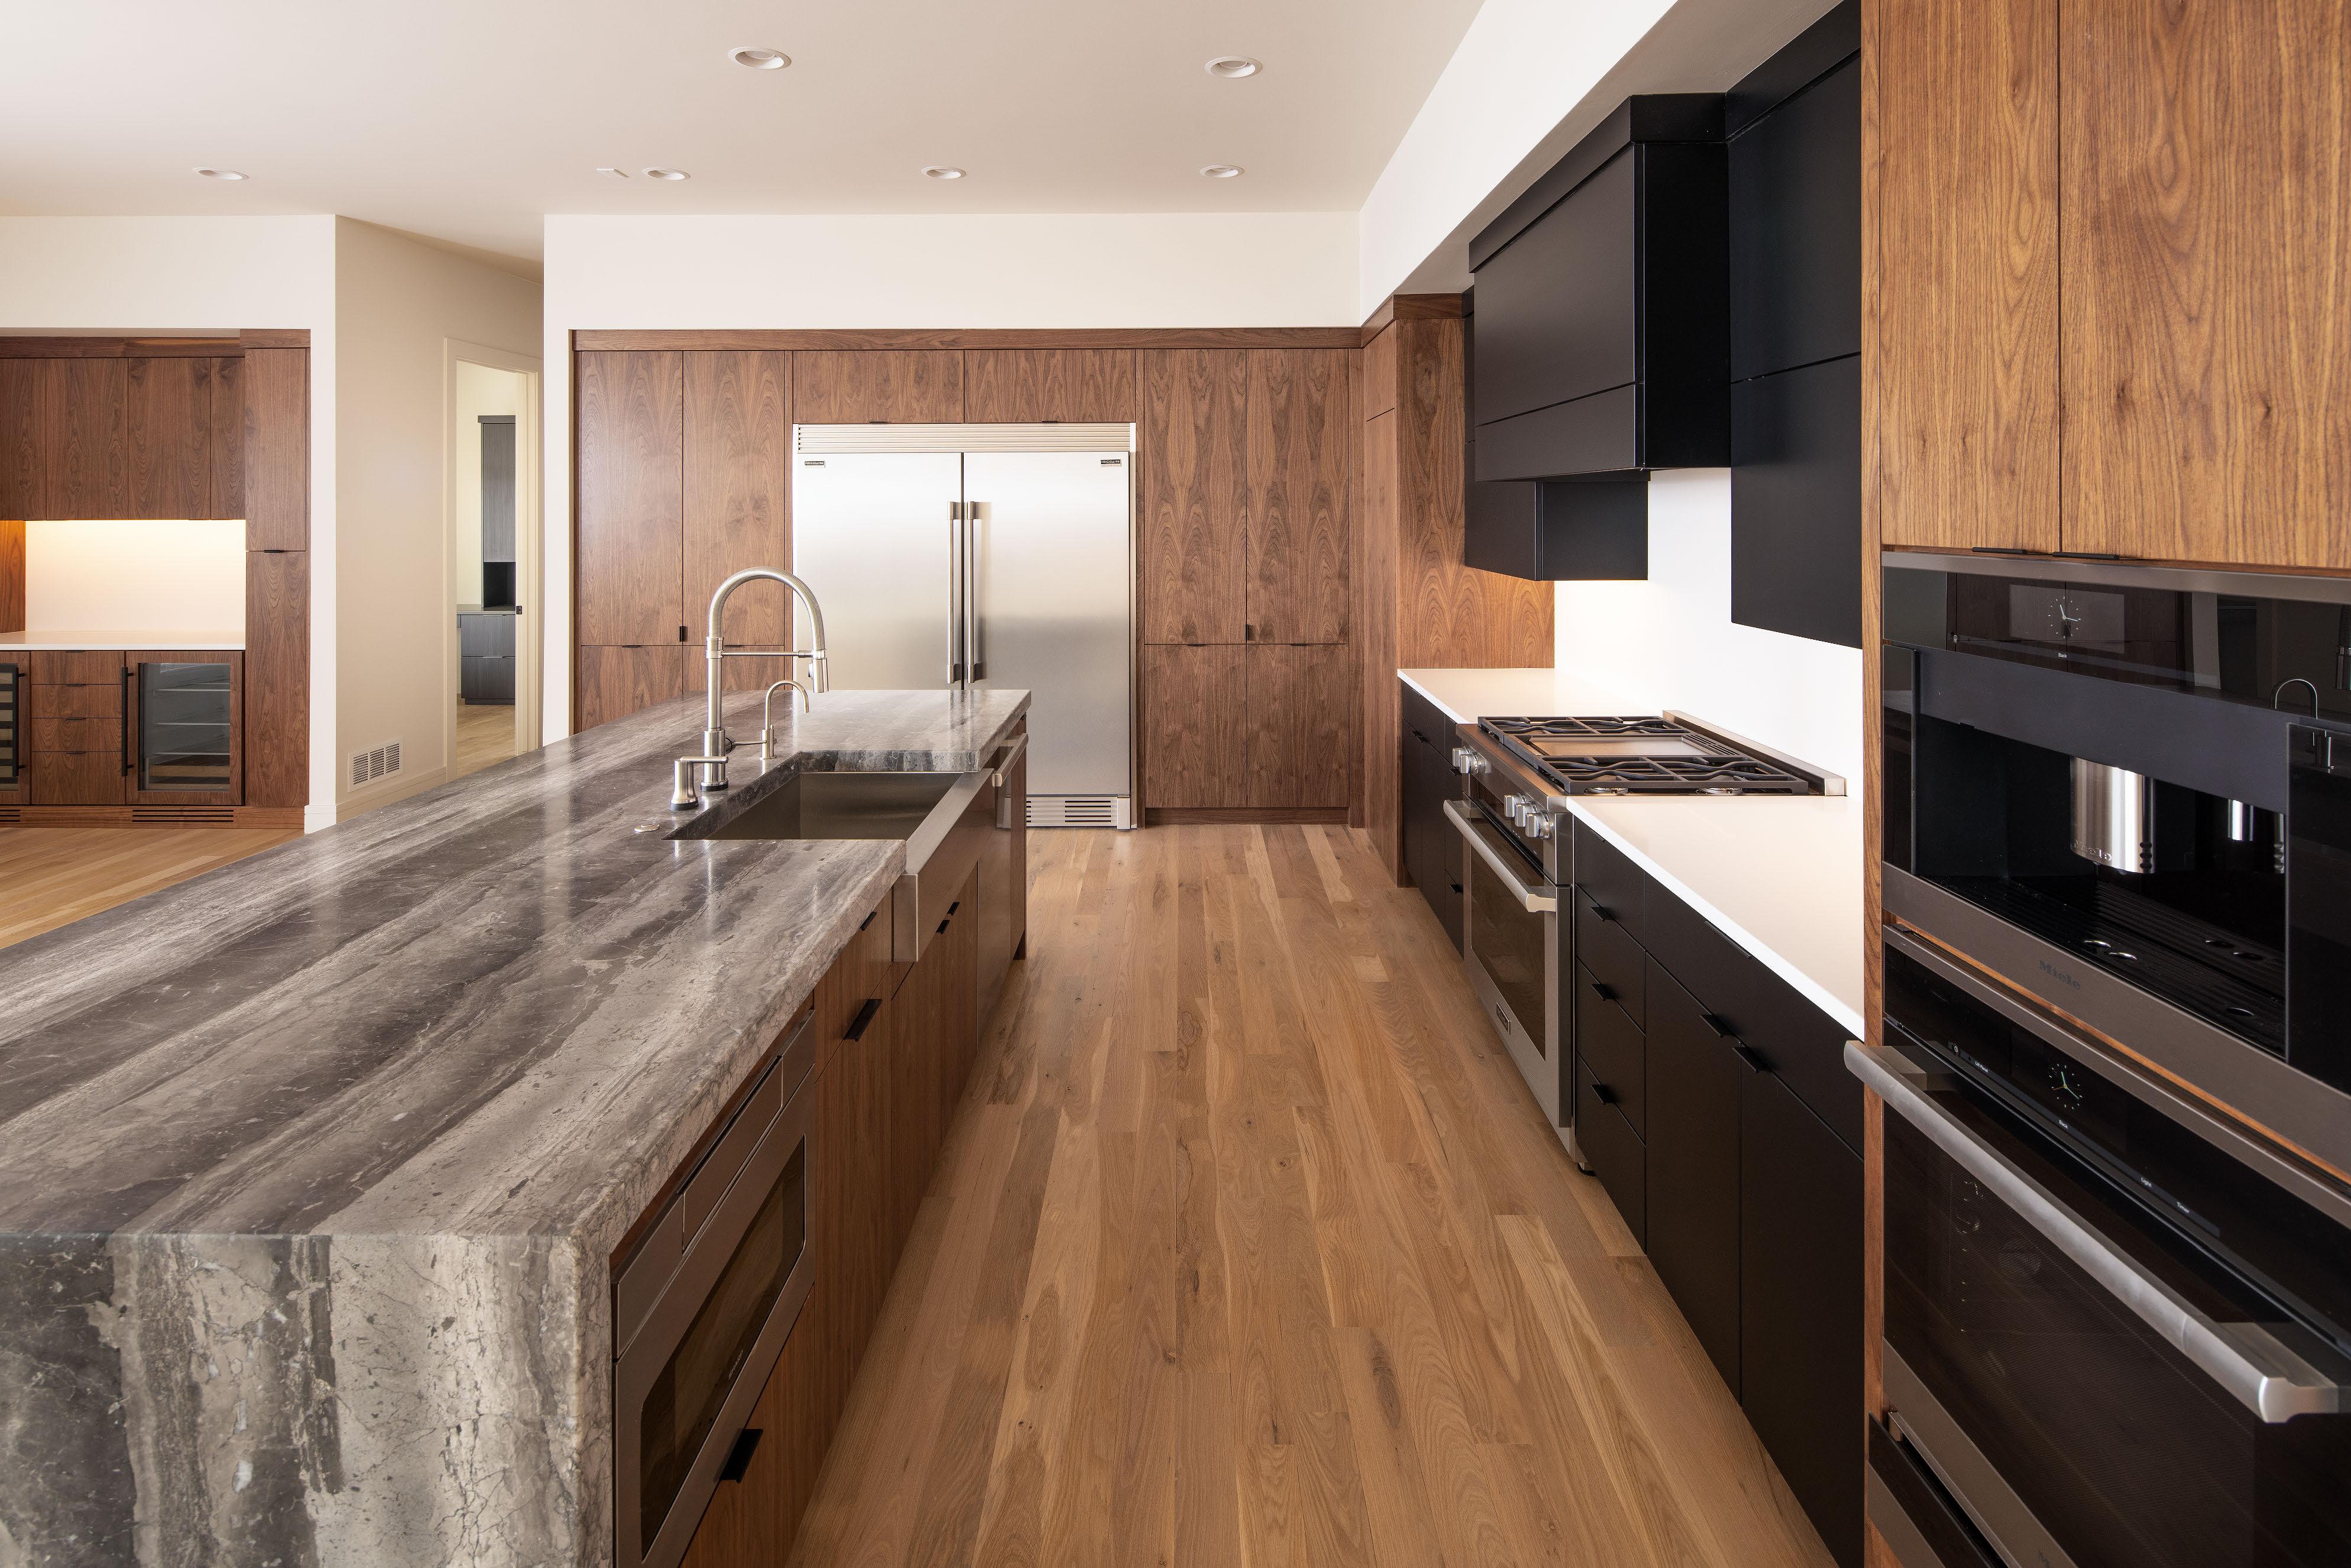 Eurowood Cabinets, Inc. - Beautiful Kitchens